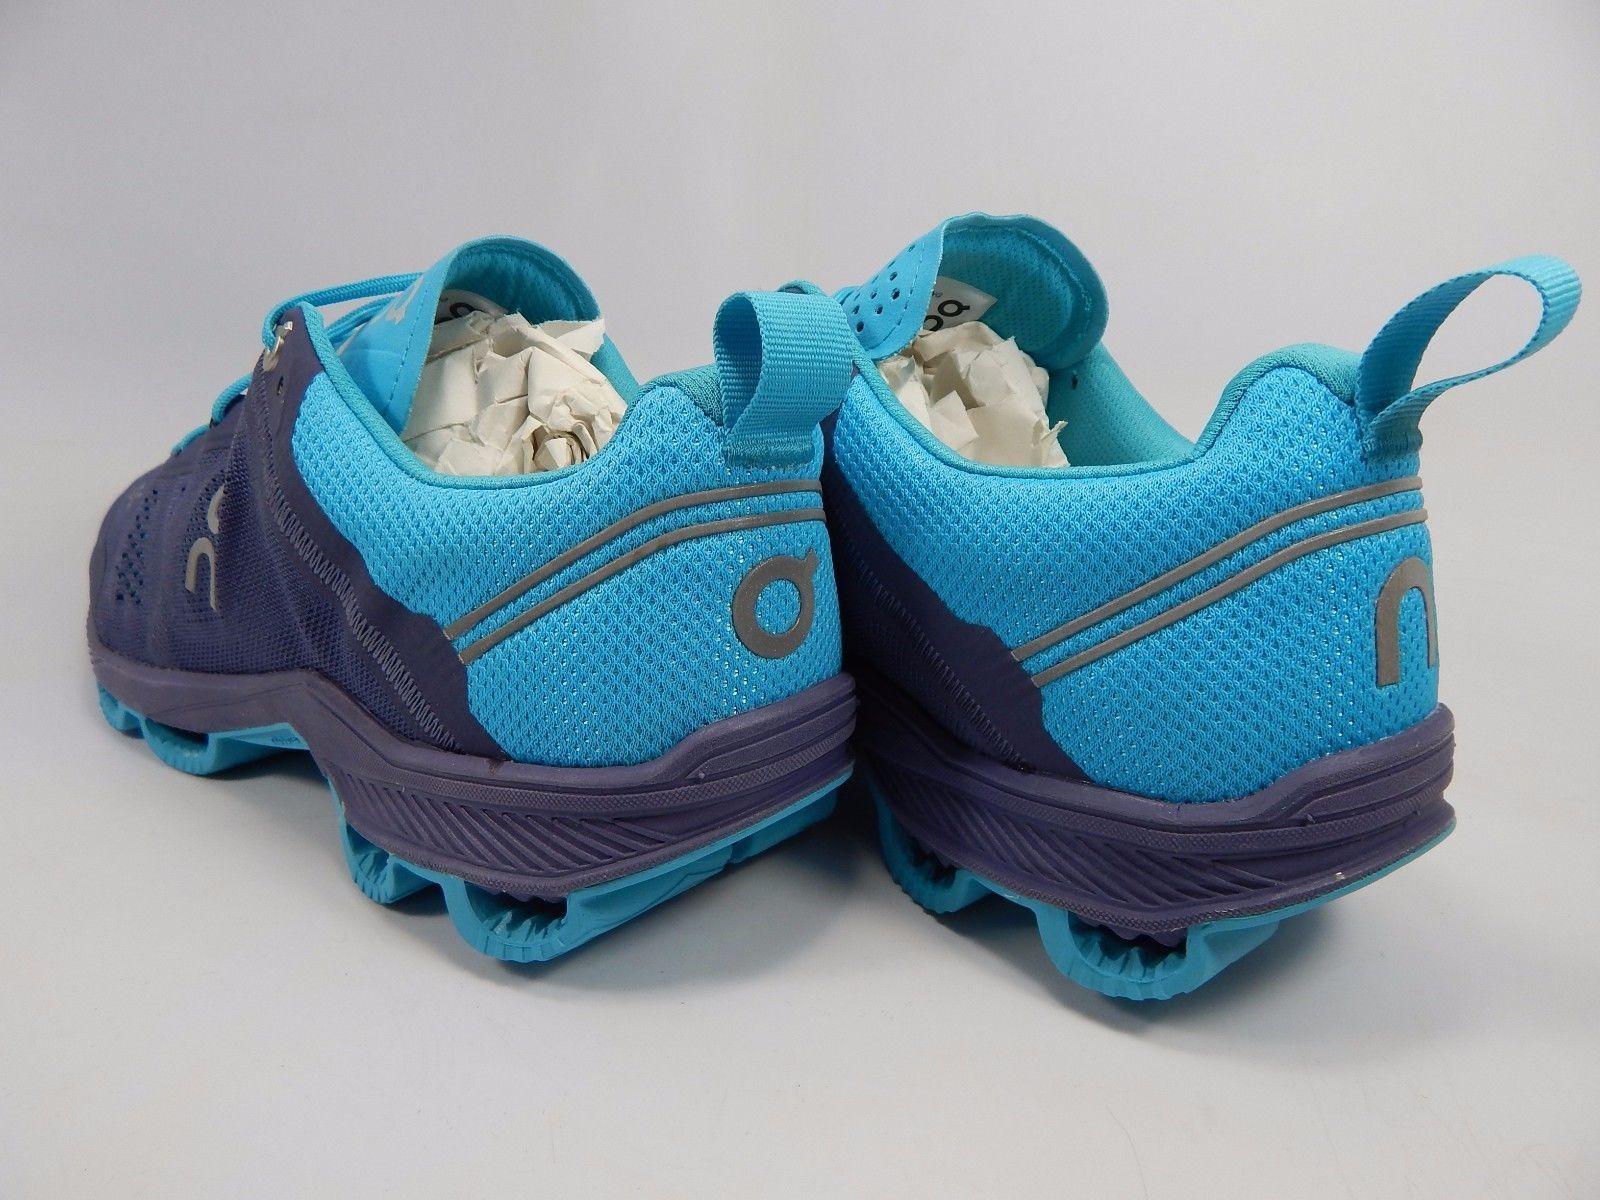 MISMATCH ON Running CloudSurfer Womens Shoes Size 8 M (B) Left & 10 M (B) Right